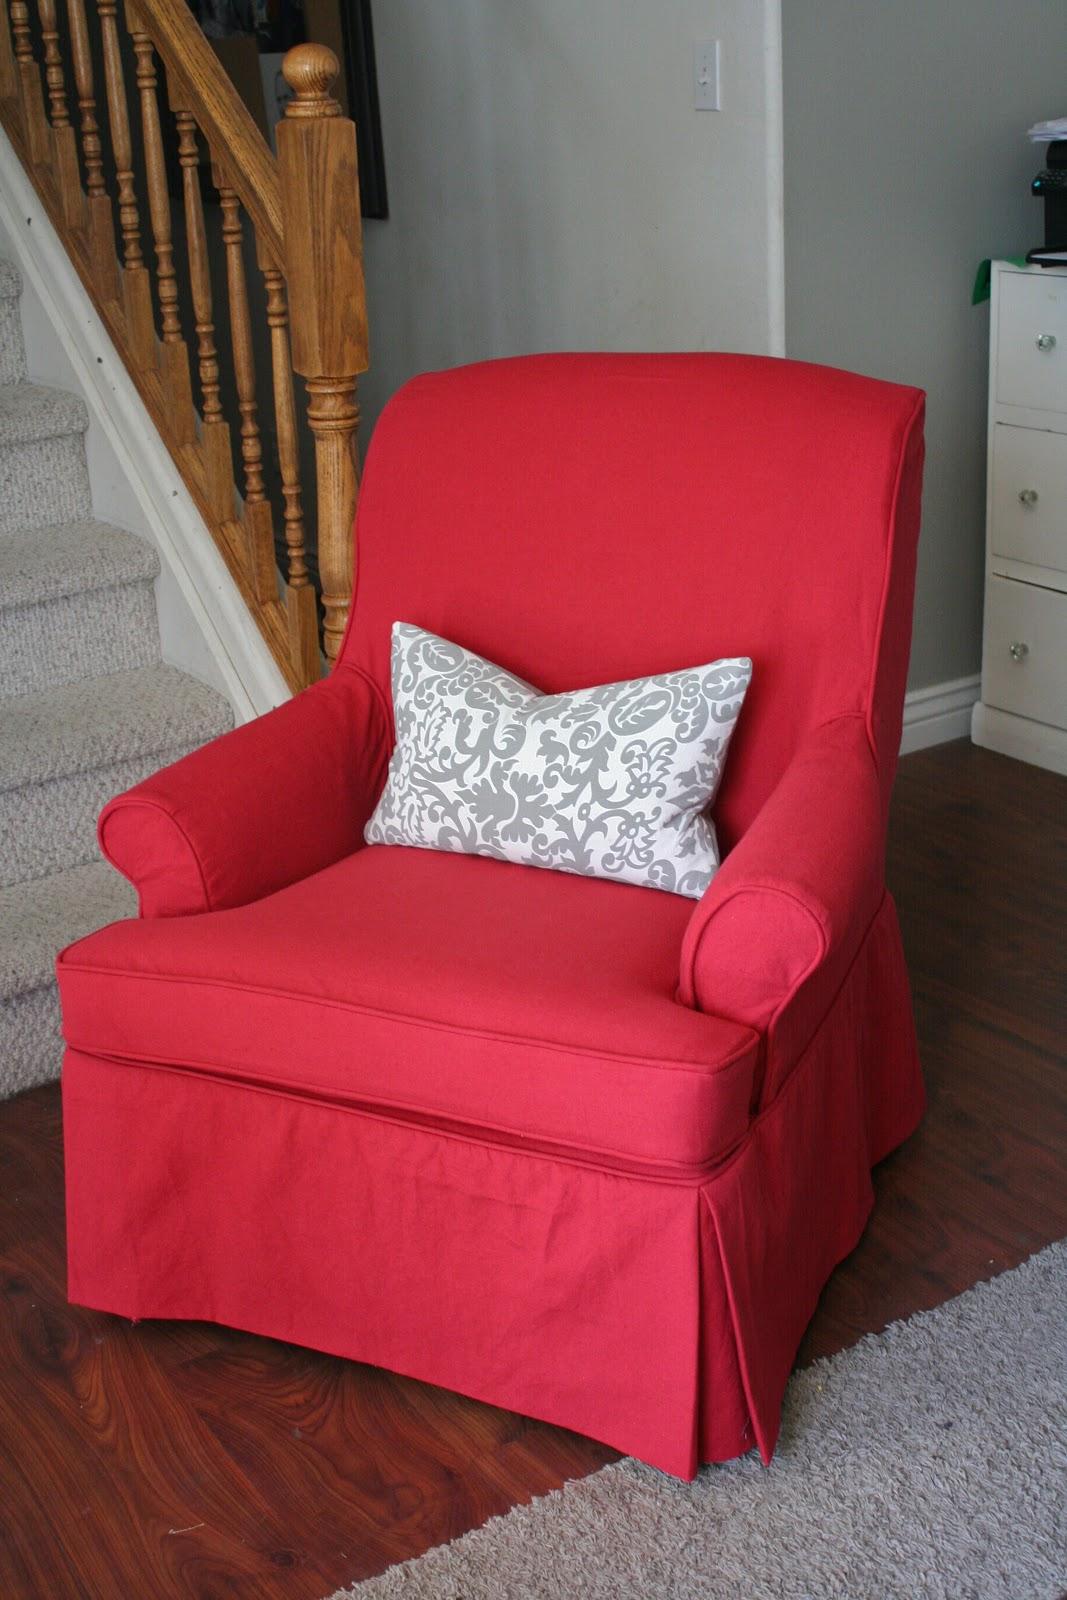 Swivel Chair Covers Folding Commode Custom Slipcovers By Shelley Rocker Redo